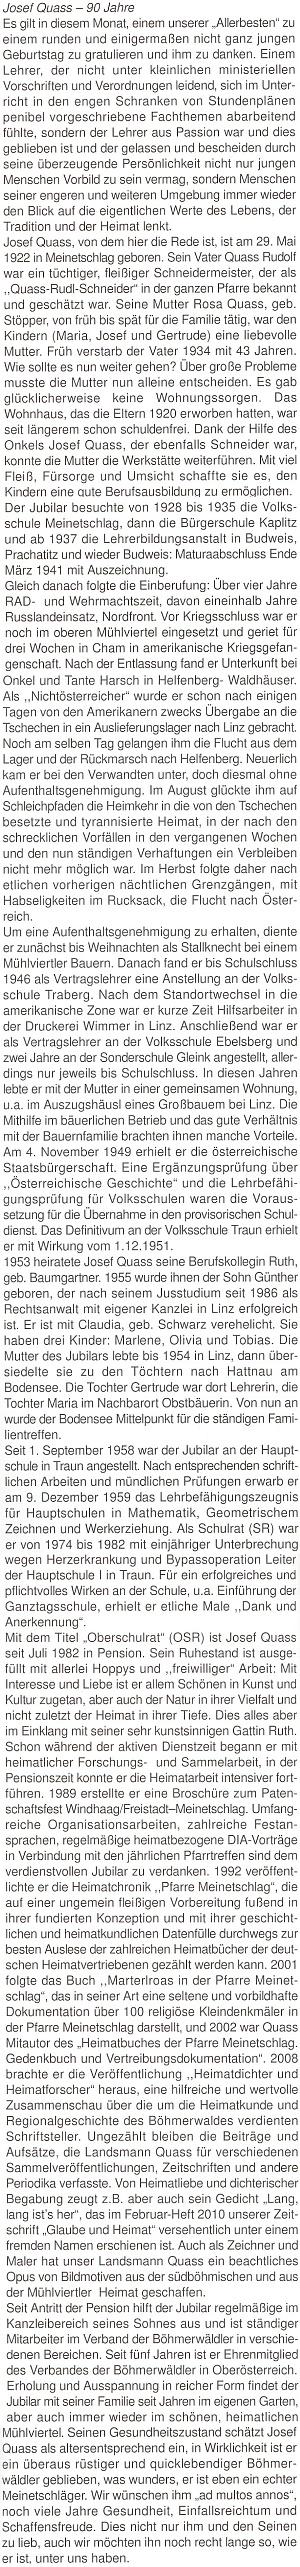 Obsáhlý pozdrav k jeho devadesátinám napsal do krajanského časopisu Alois Harasko...